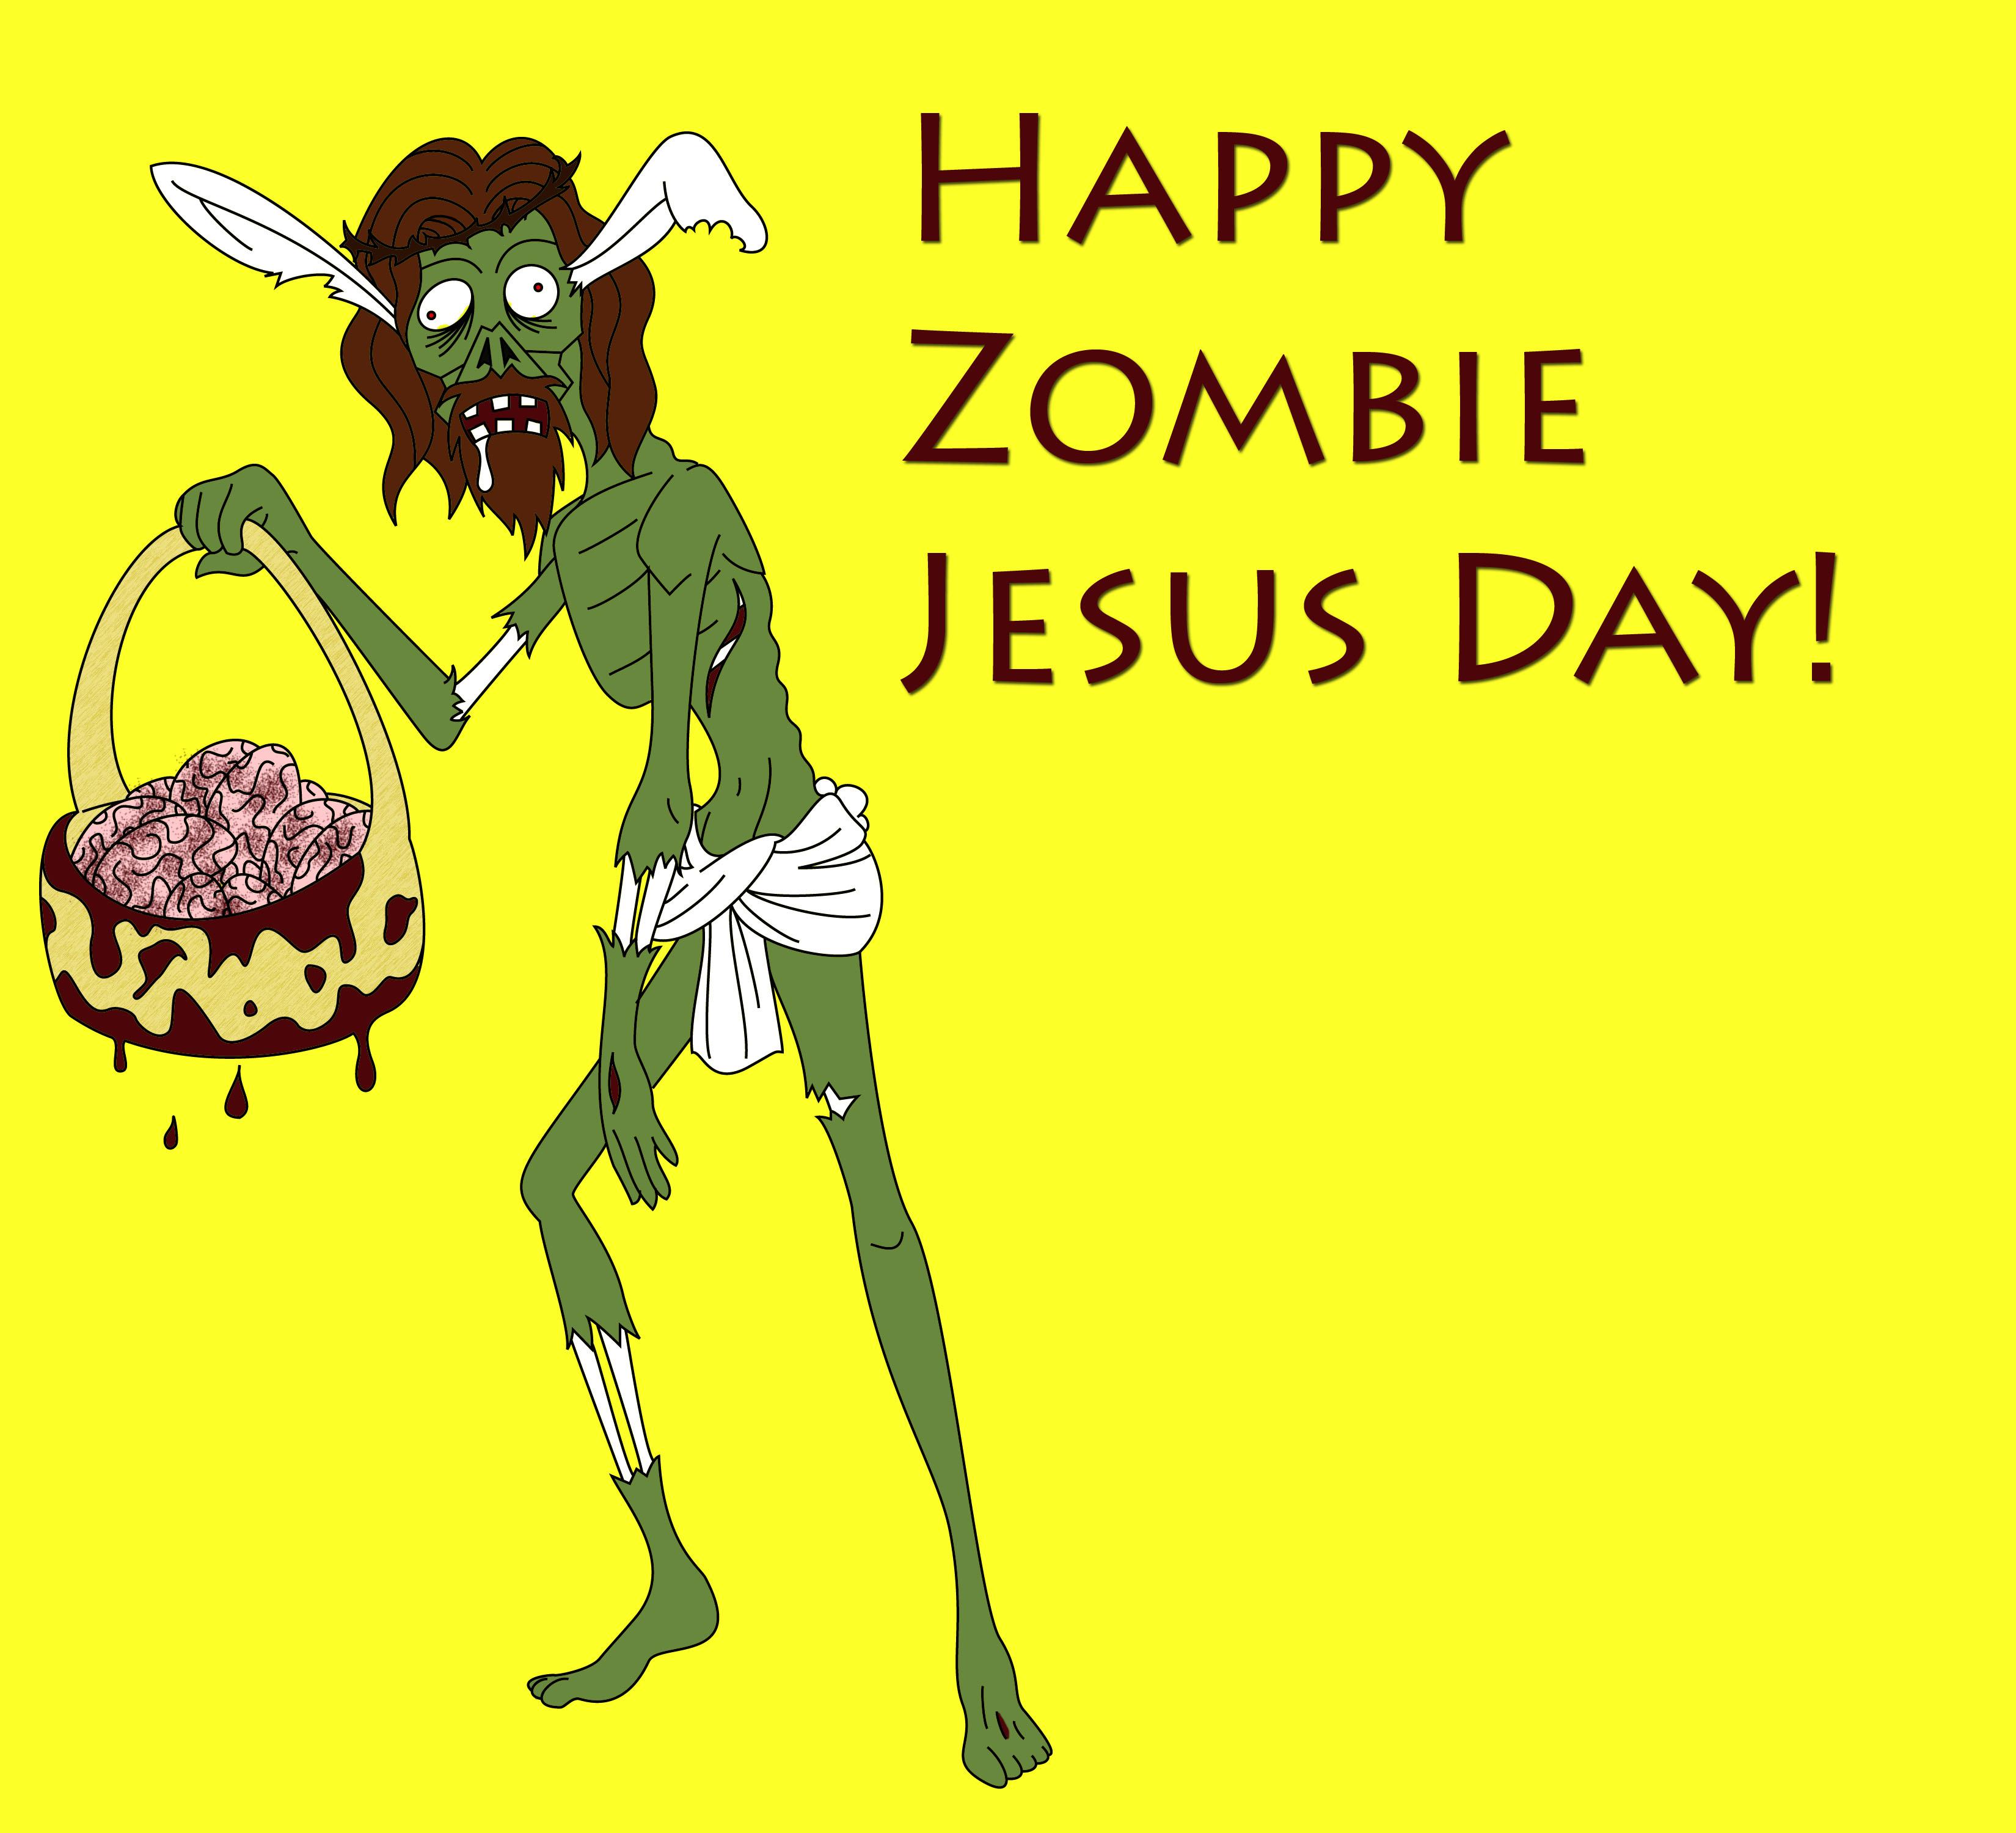 [Image: Happy_Zombie_Jesus_Day_by_Thunder_Tomoko.jpg]